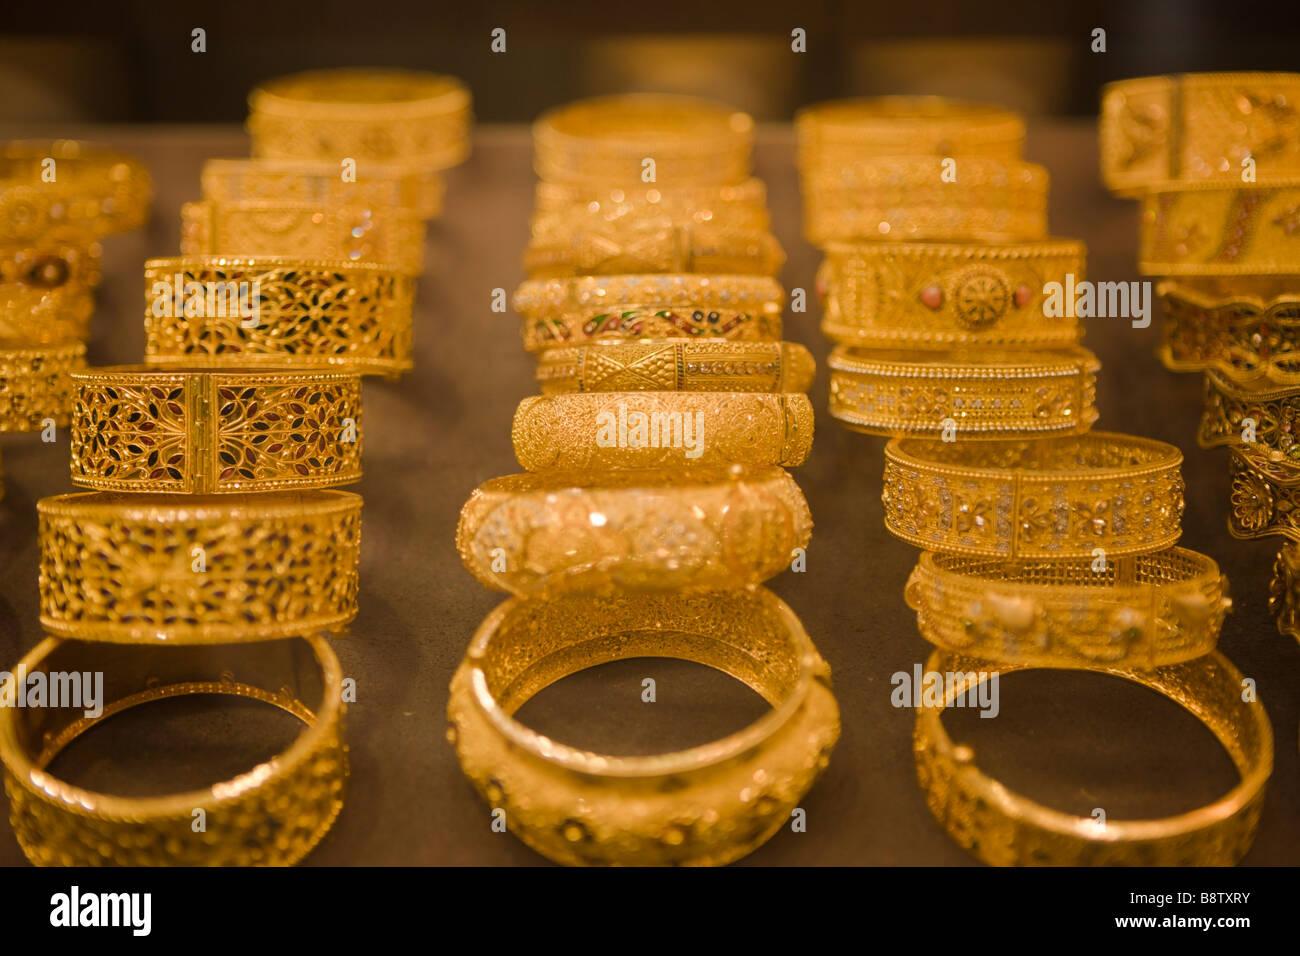 Jewelery at Egyptian Bazaar Istanbul Turkey - Stock Image